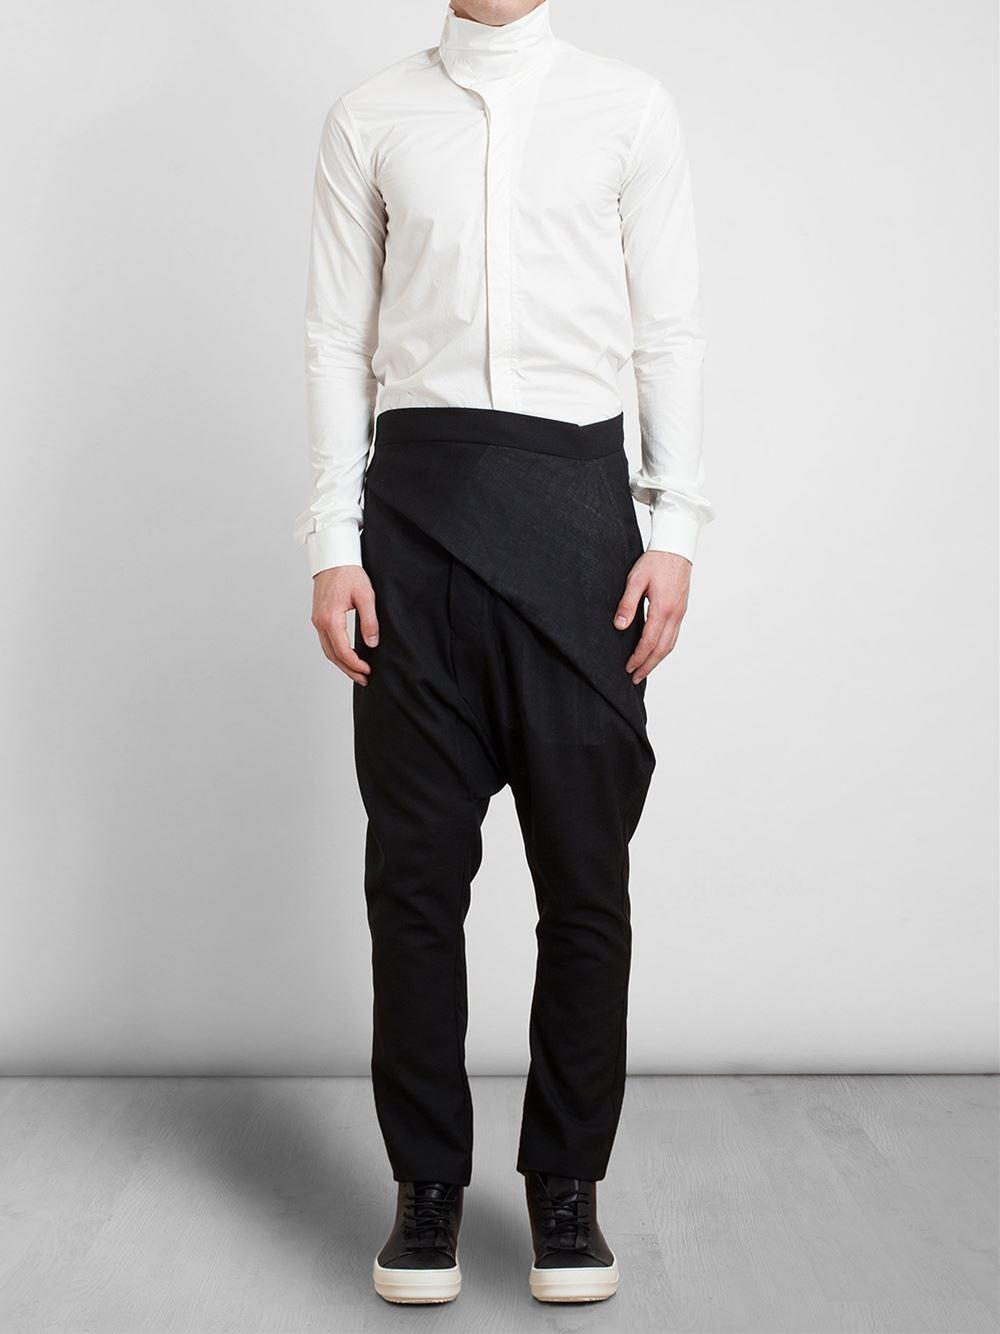 Drop Crotch Wrap Pants 1